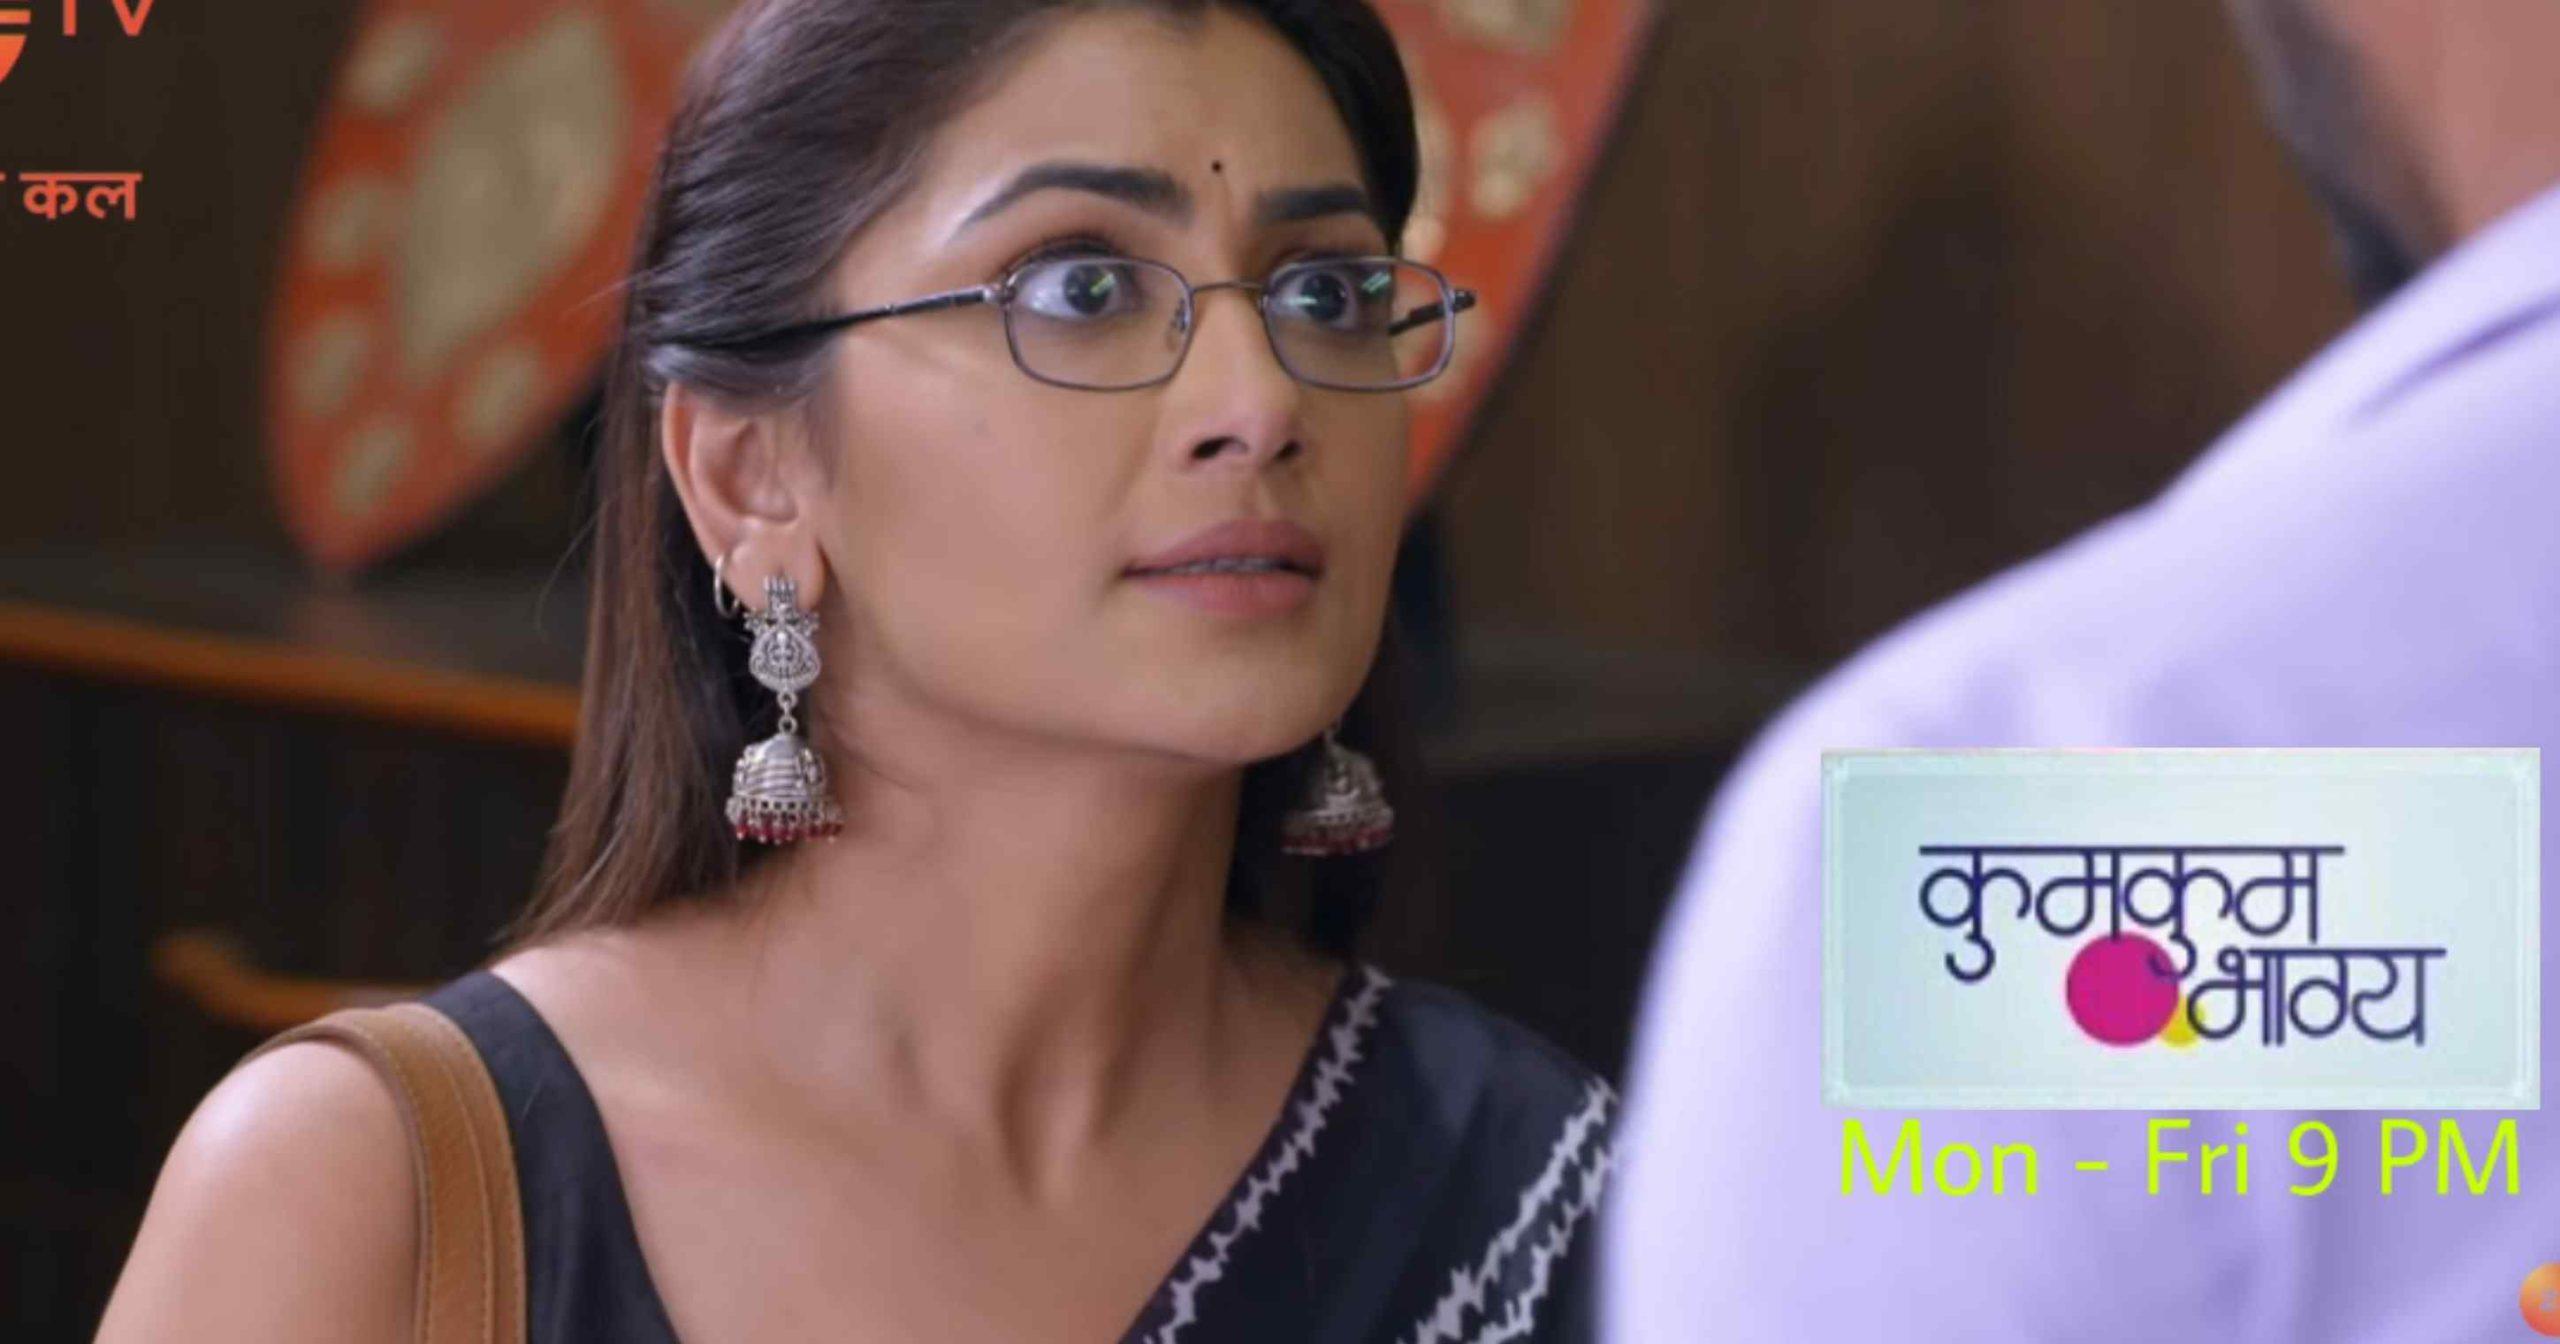 KumKum Bhagya ▶ Watch Hindi online Full Latest Episode by Zee TV